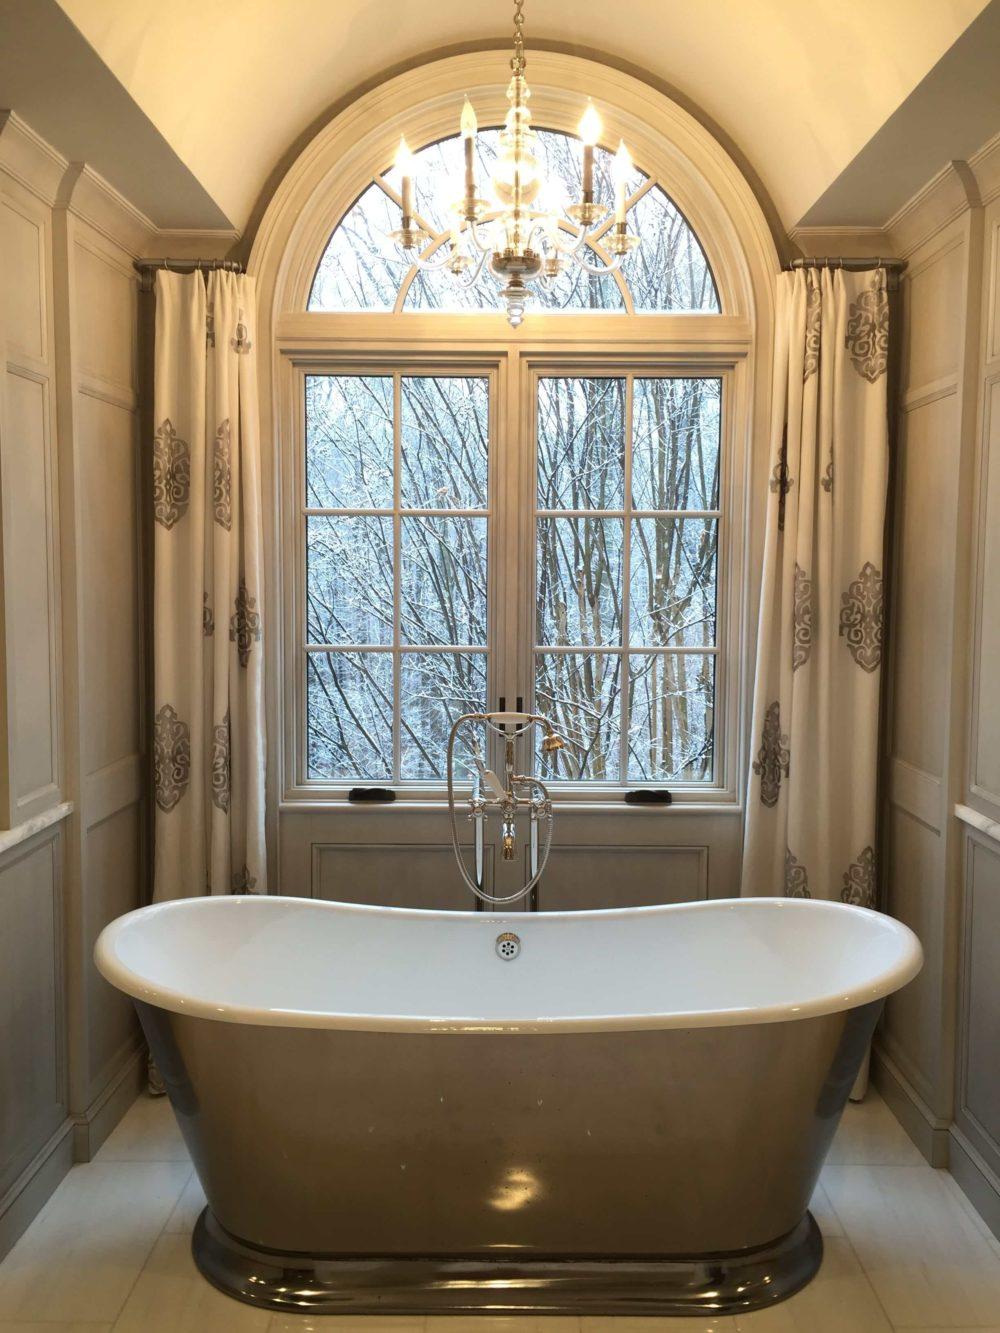 Freestanding Tub in Great Falls Virginia Bathroom Renovation